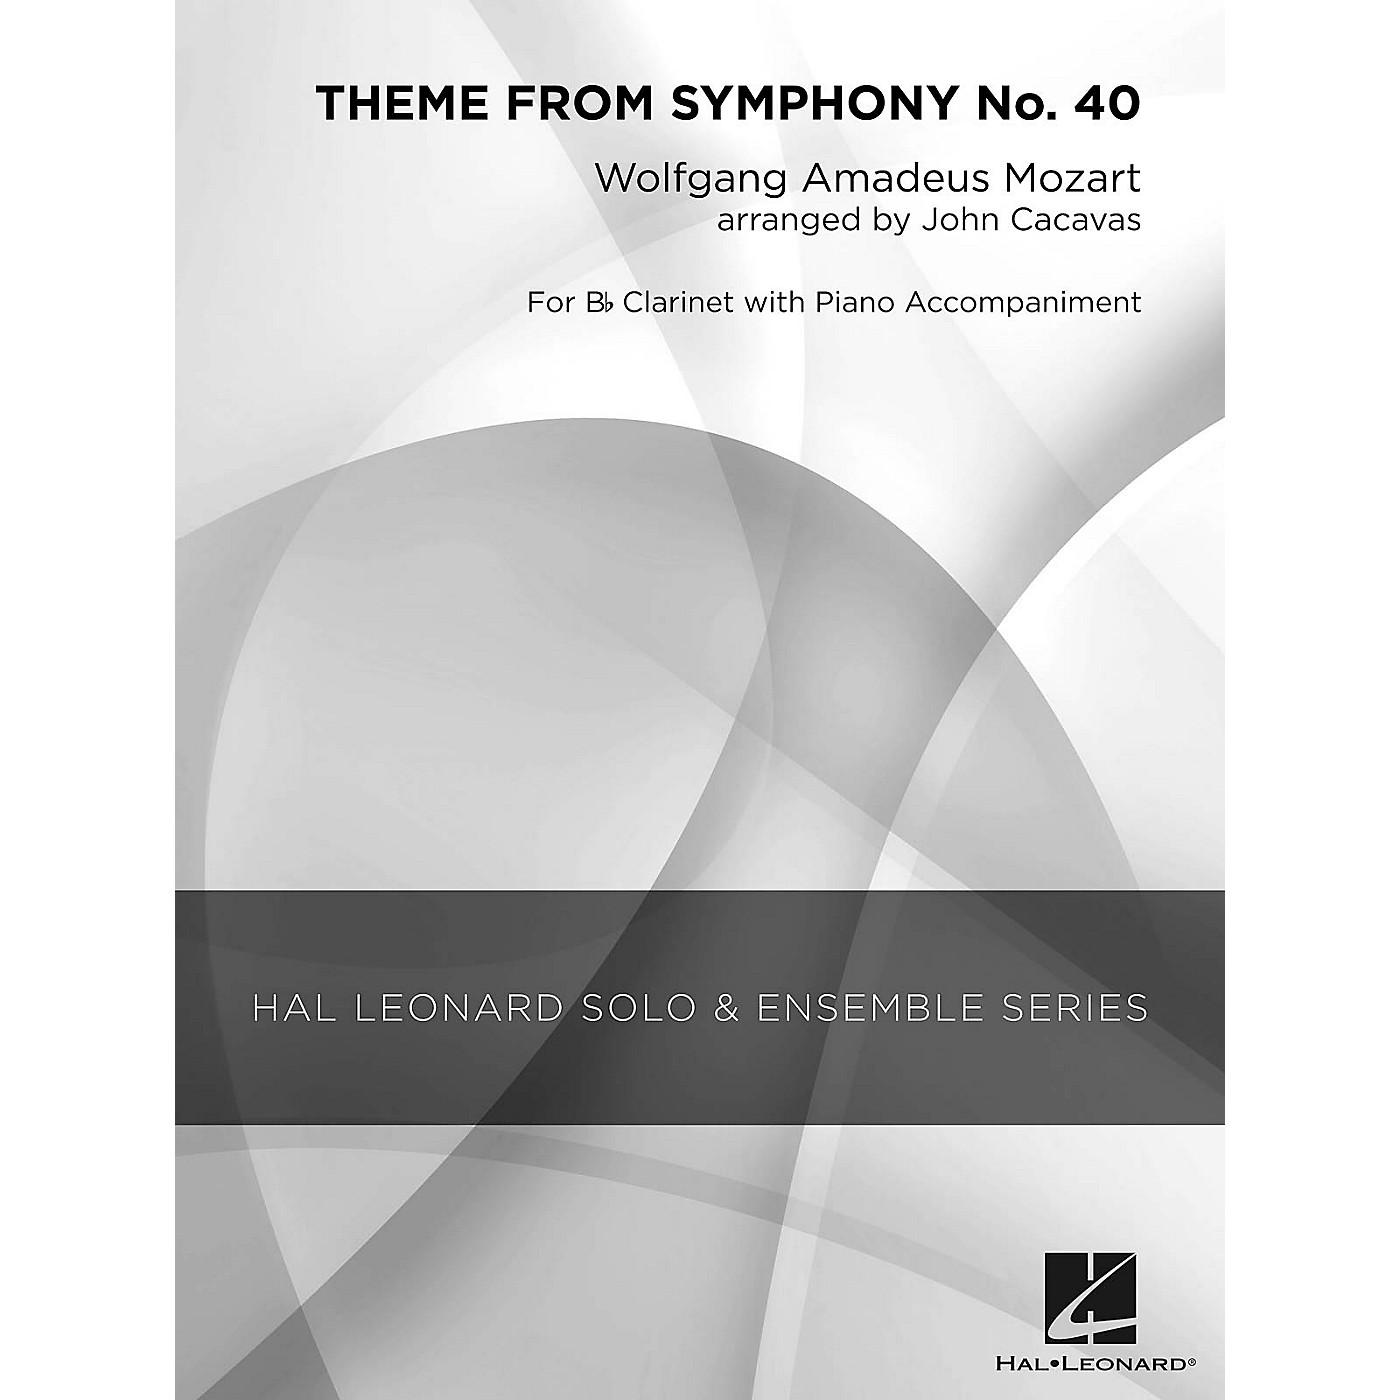 Hal Leonard Theme from Symphony No. 40 (Grade 3 Clarinet Solo) Concert Band Level 3 Arranged by John Cacavas thumbnail